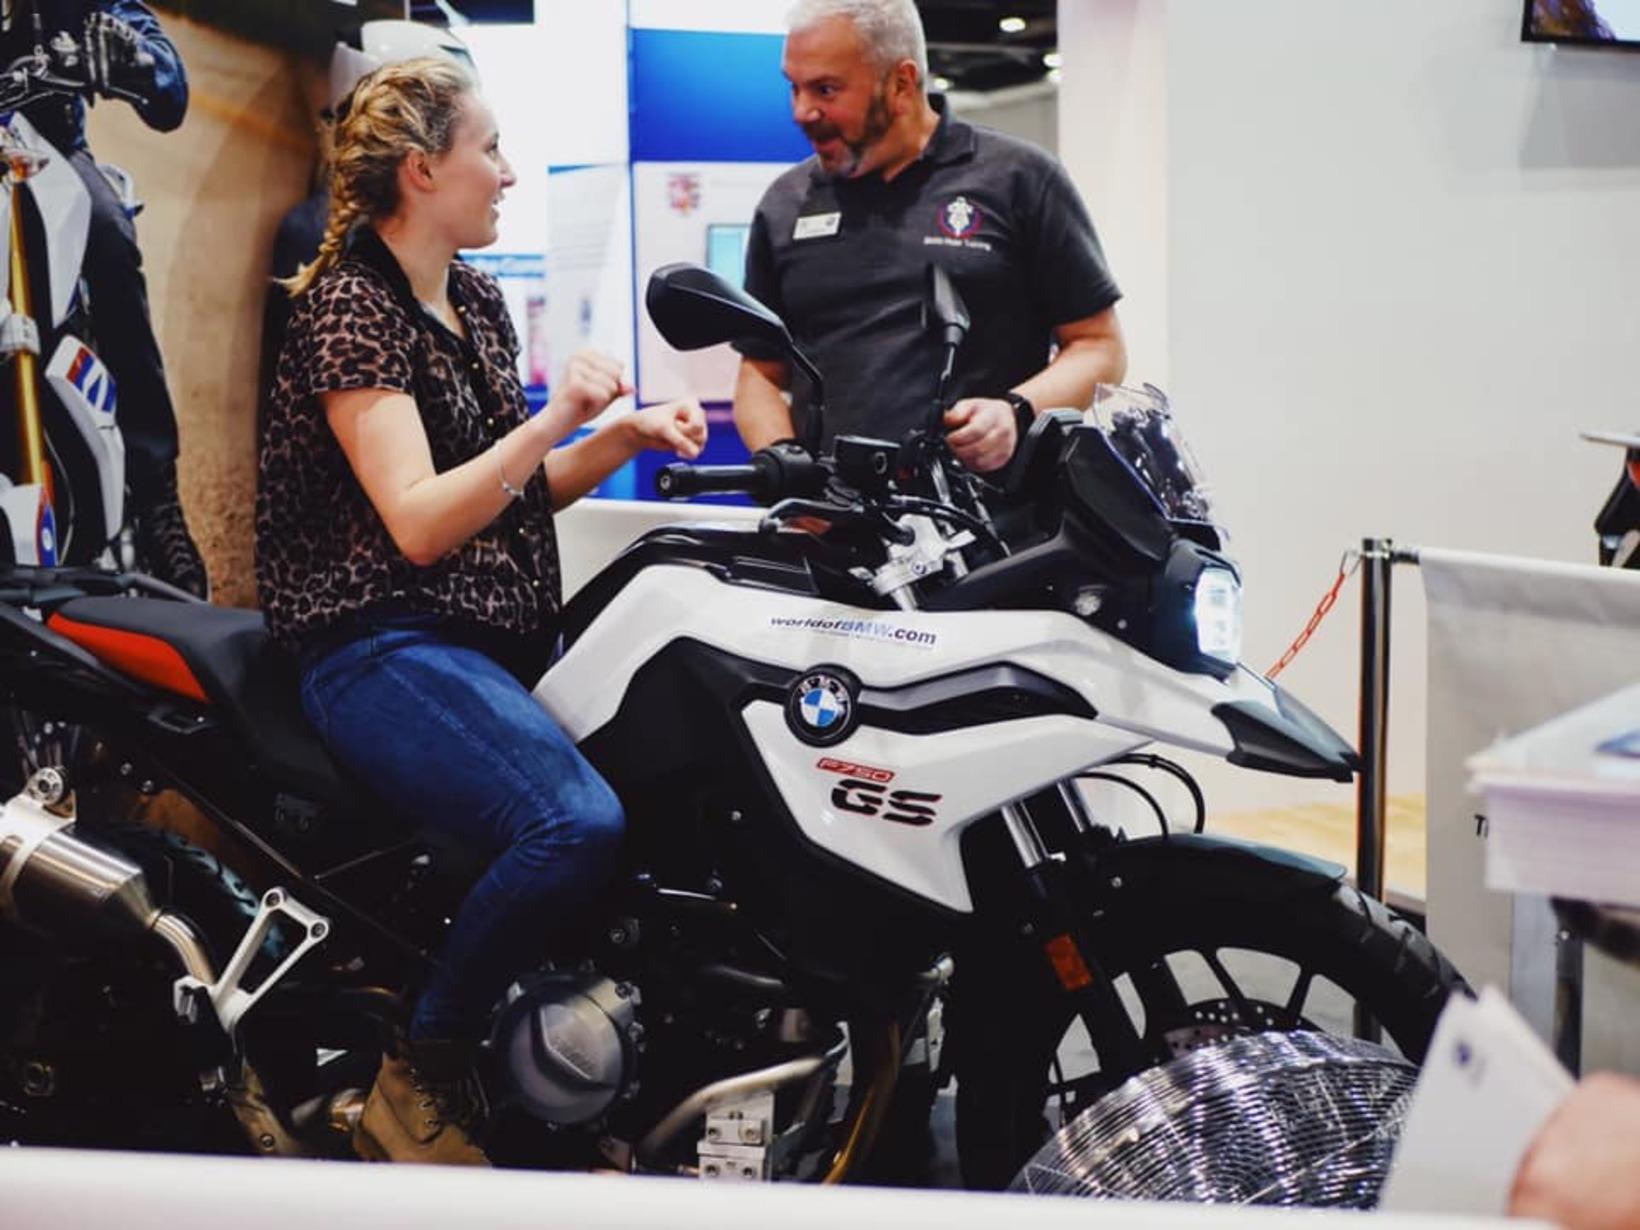 See us at MotorcycleLive 2019!